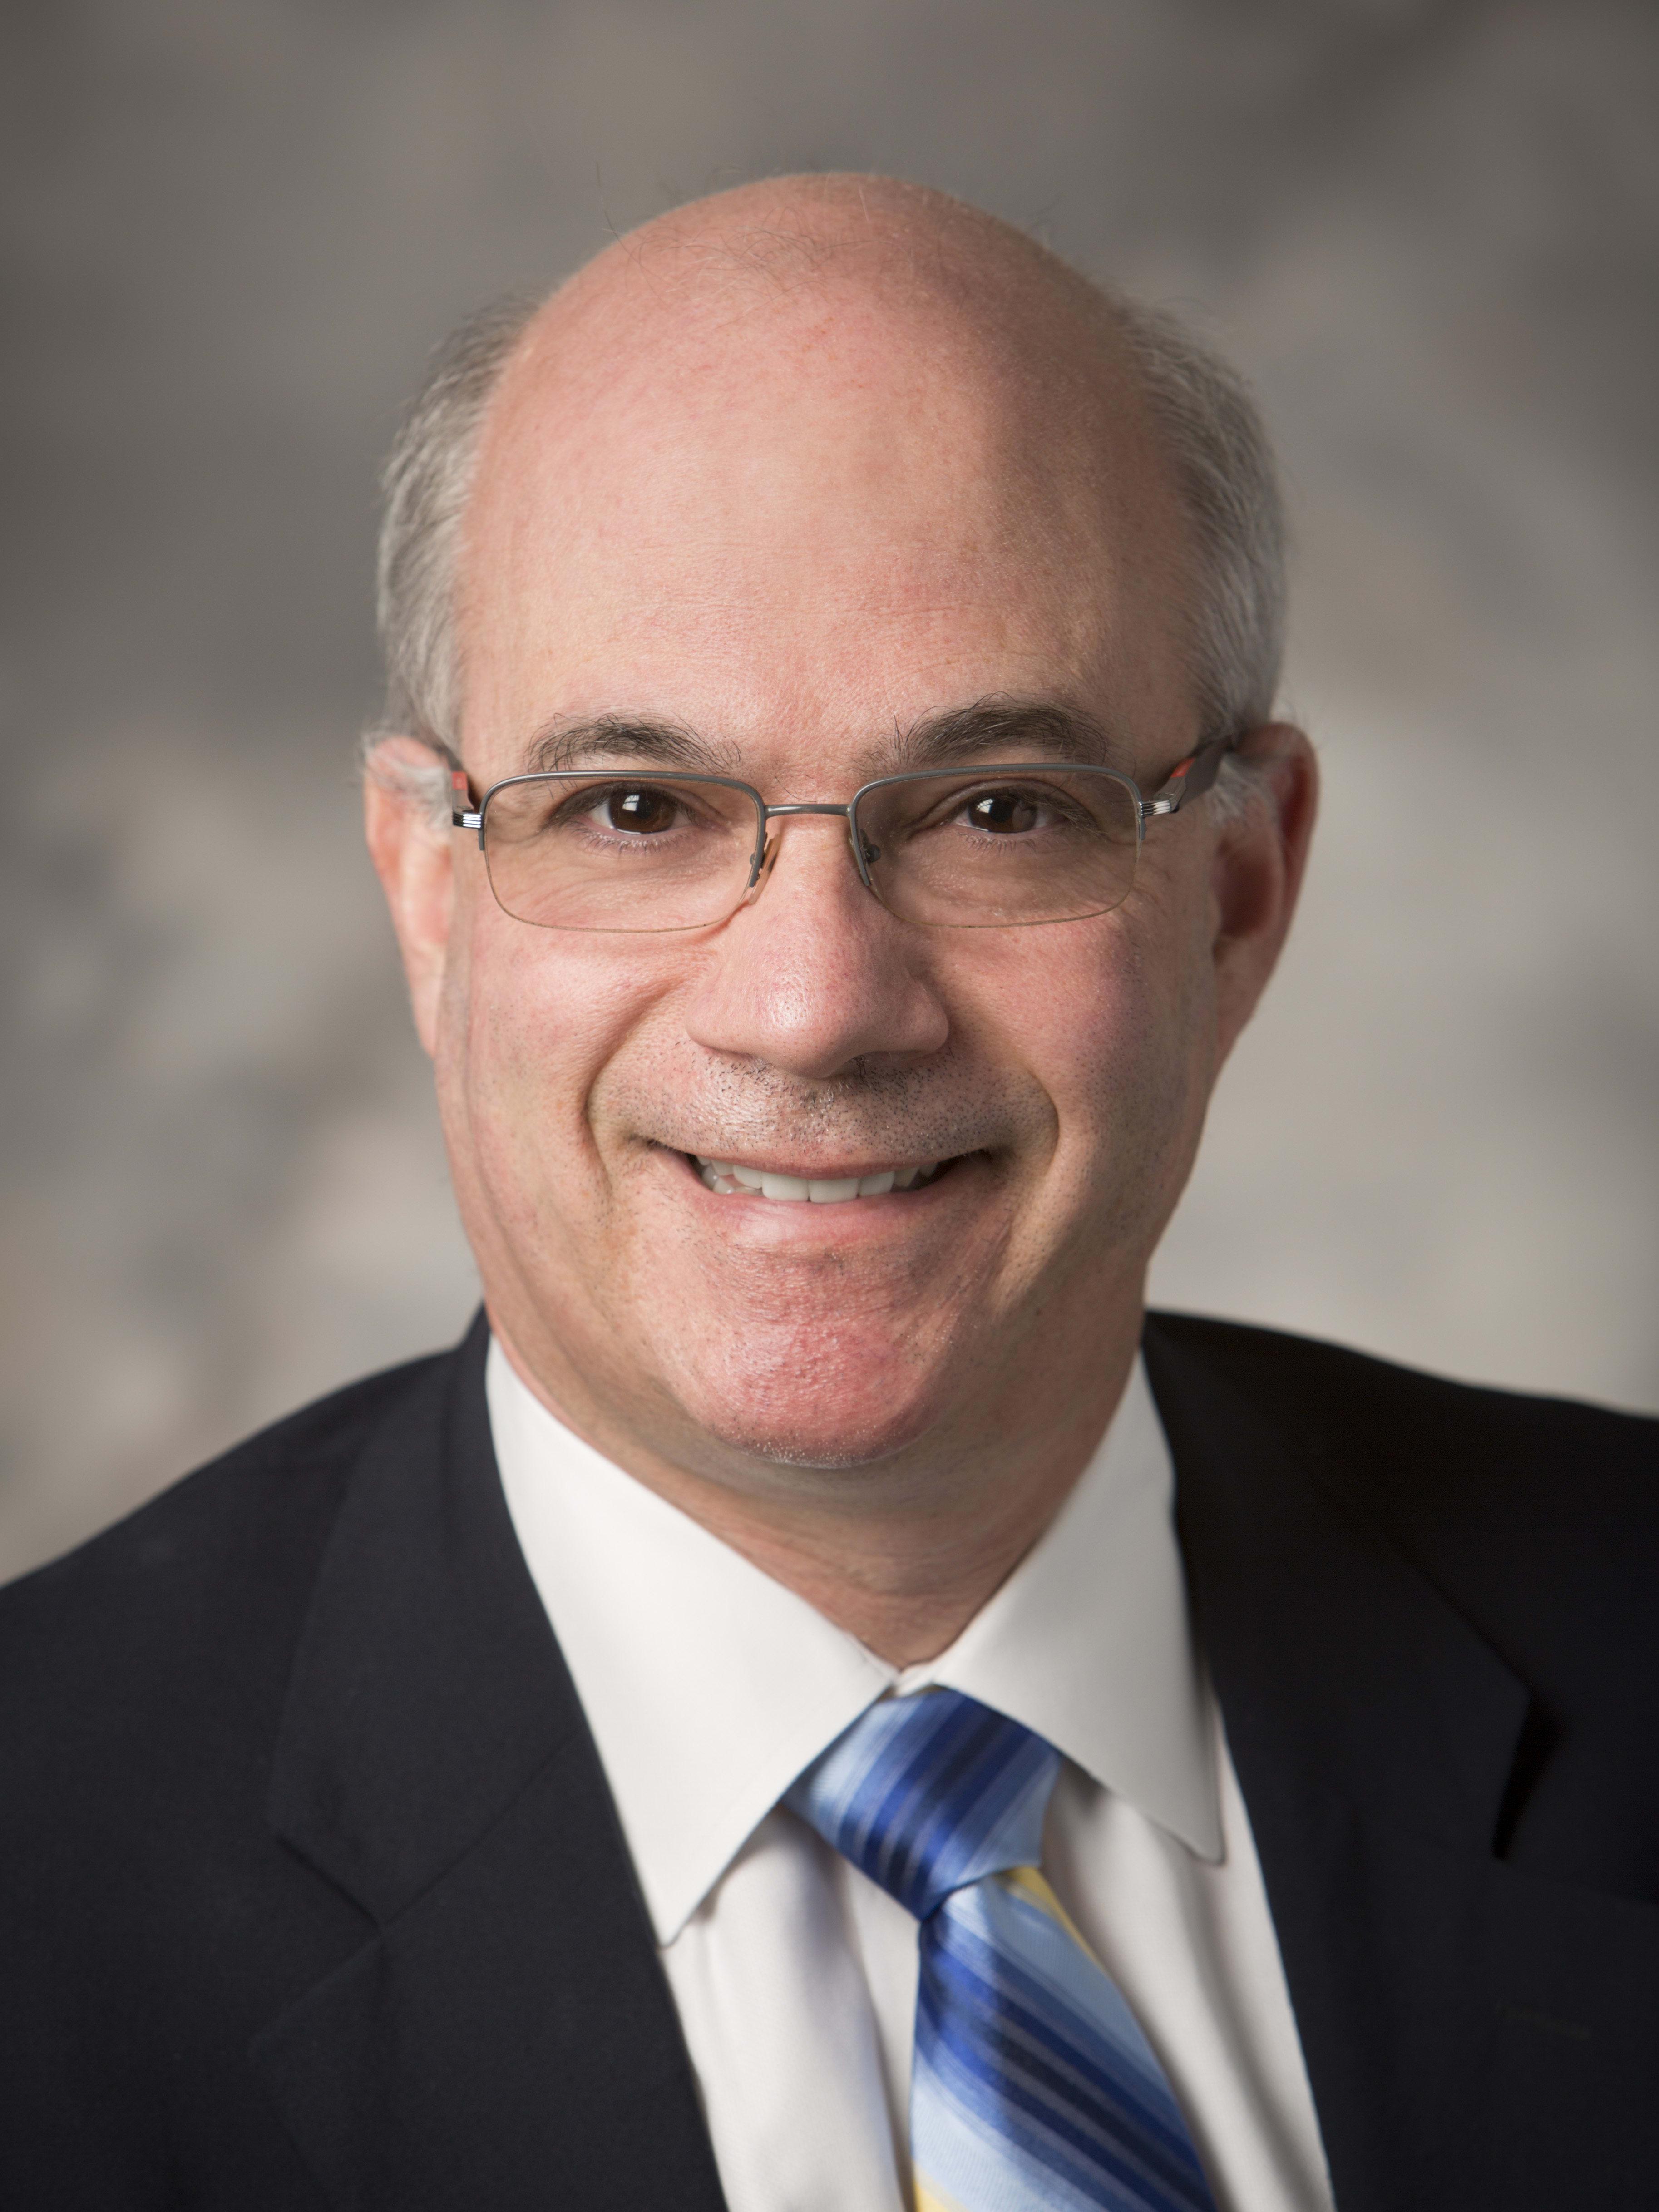 Eric Grubman